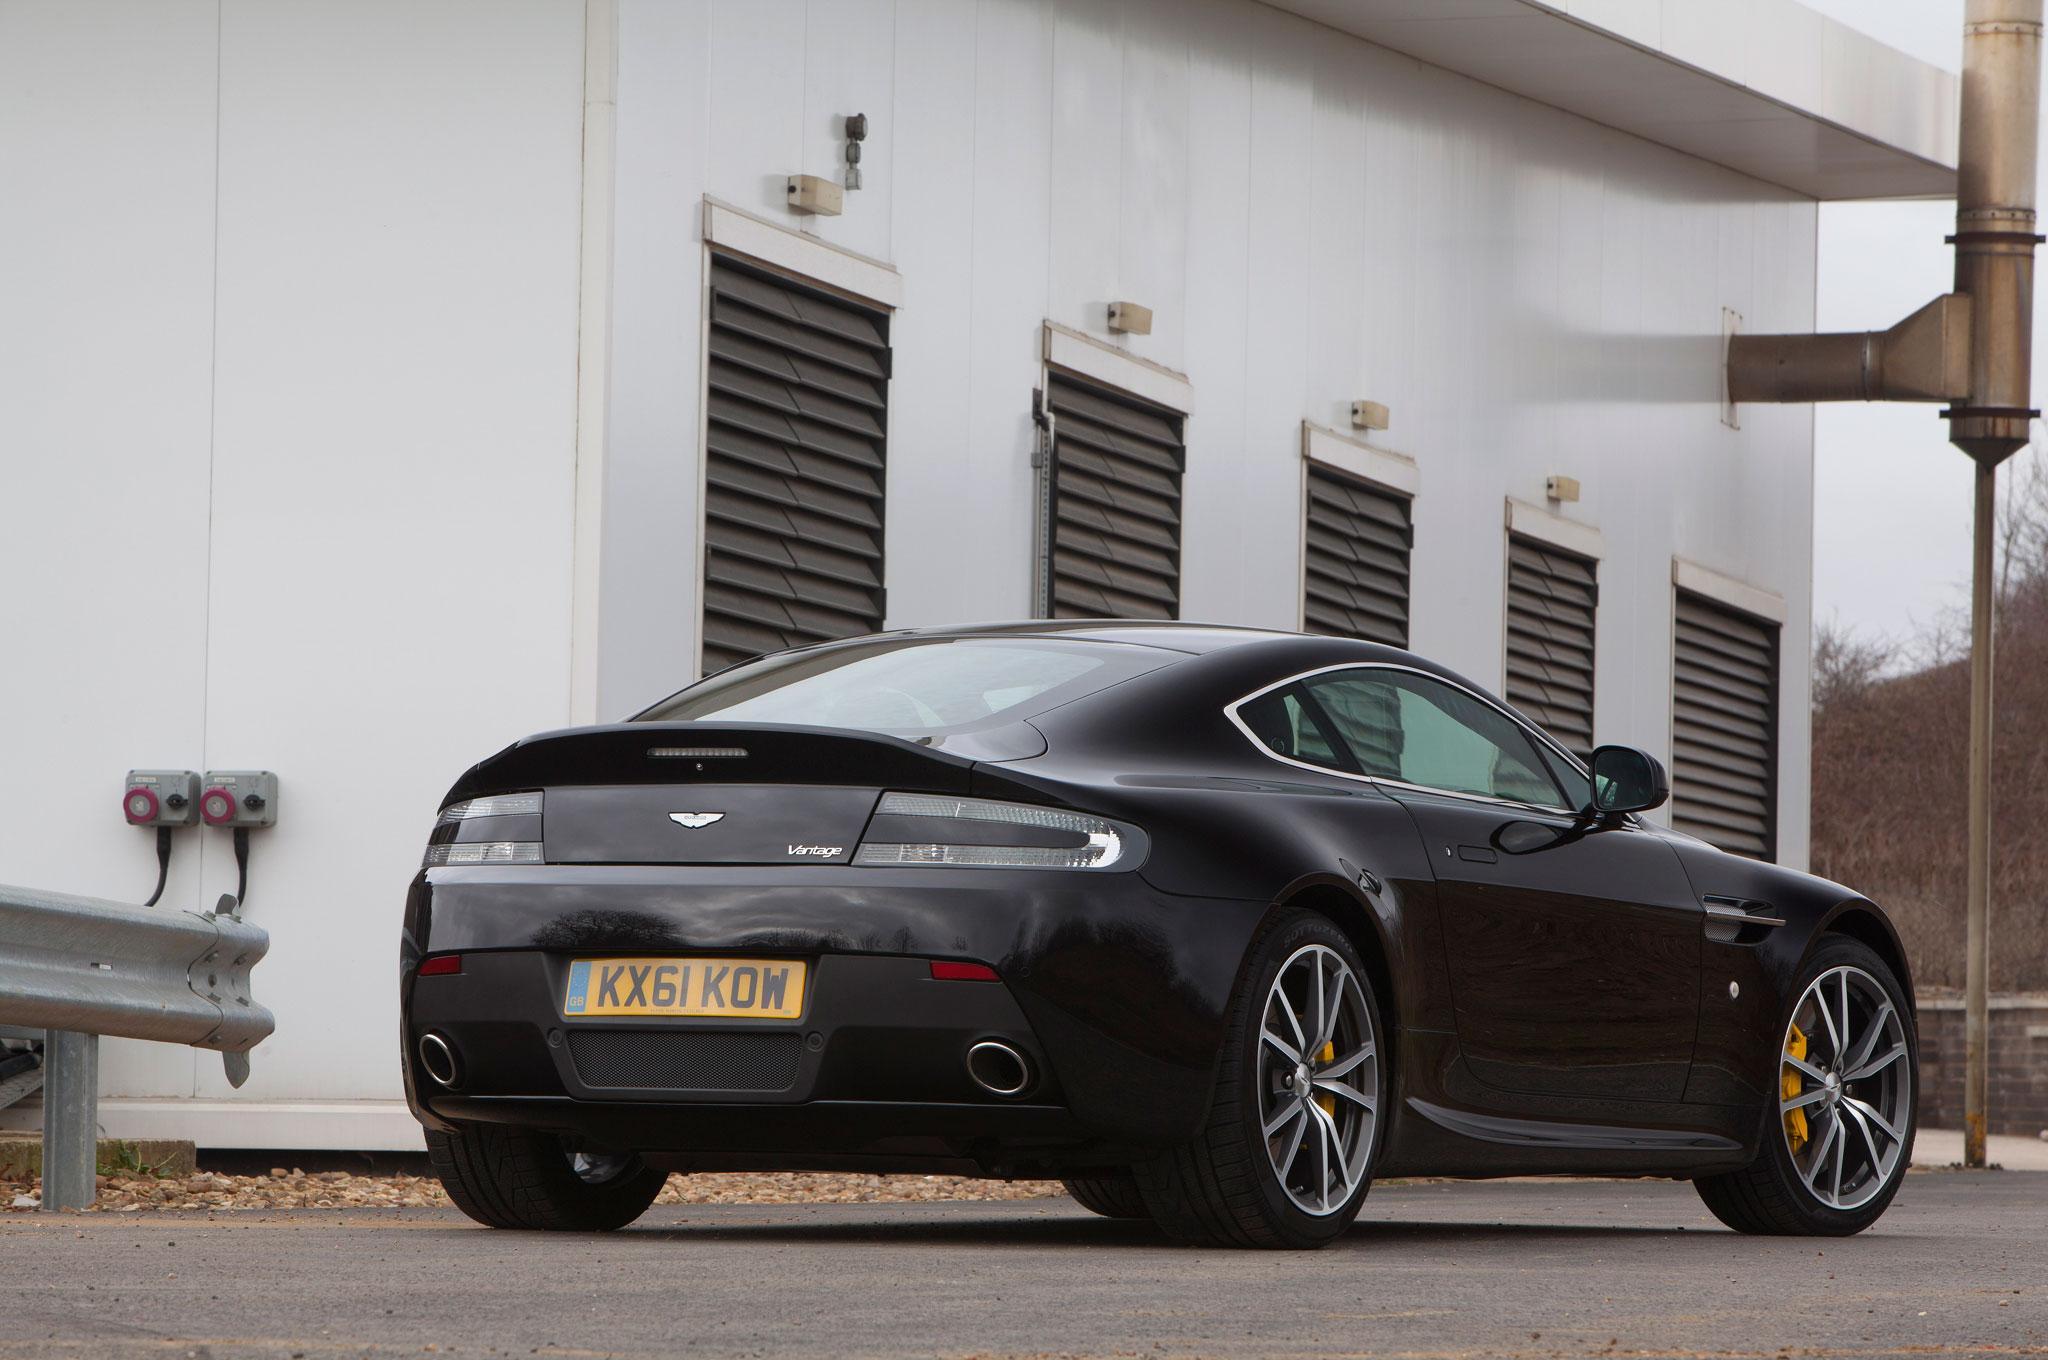 2008 Aston Martin V8 Vantage Roadster Top Convertible Feature